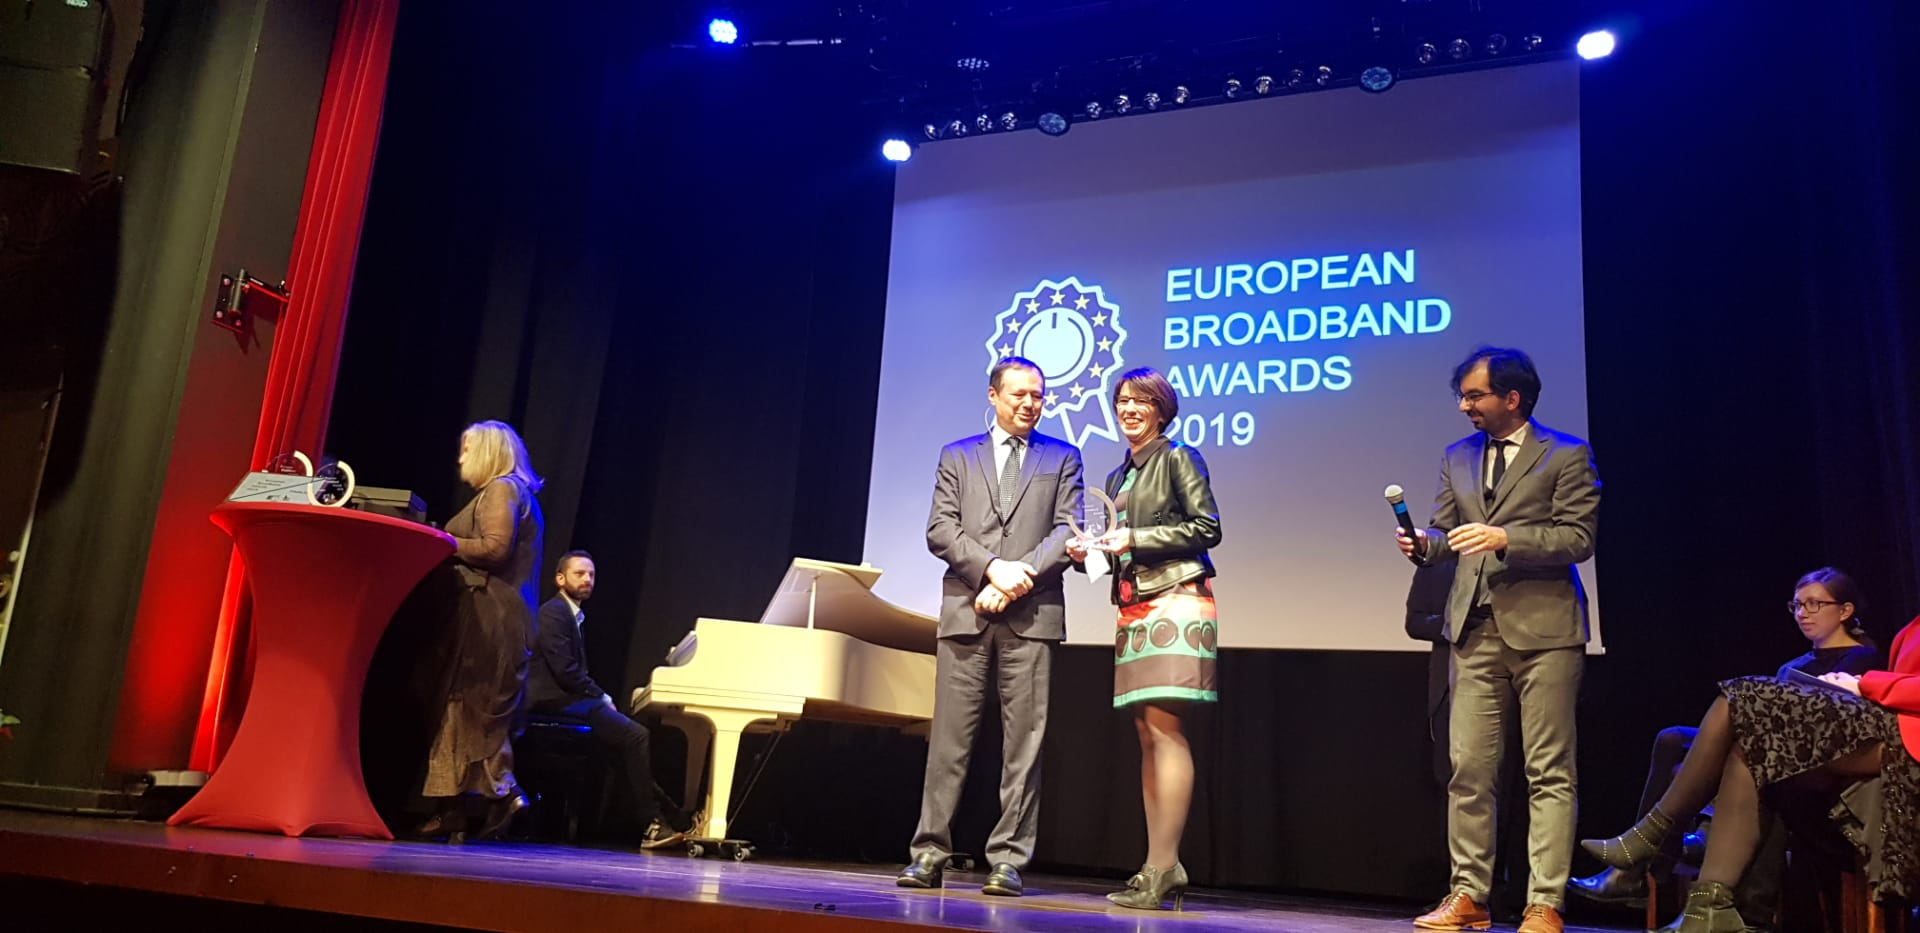 premio_europeo_banda_ancha_5B68A1B5C64F.jpeg